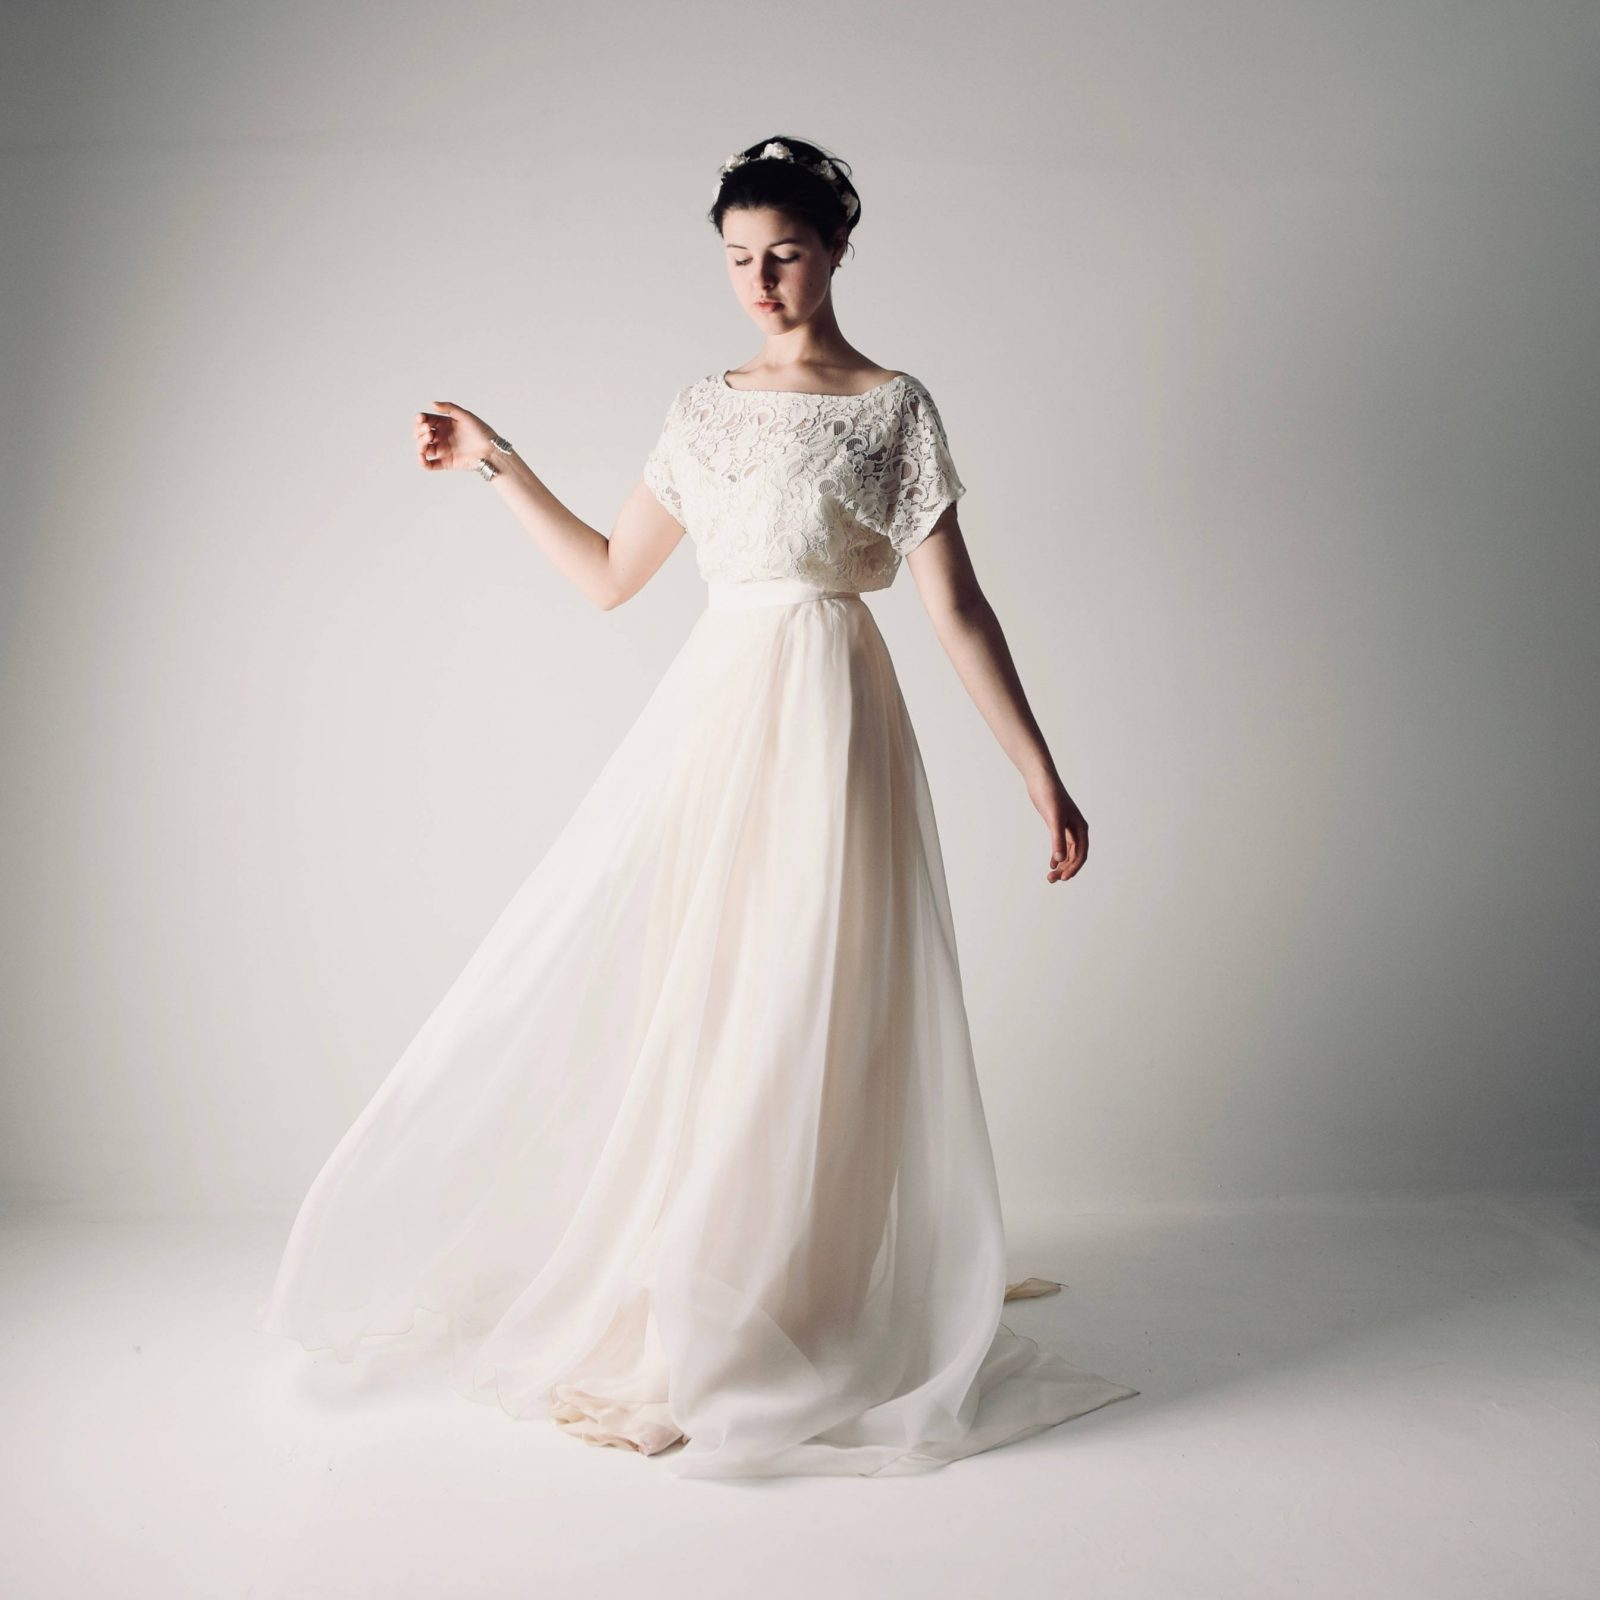 Bohemian Wedding Dress Separates